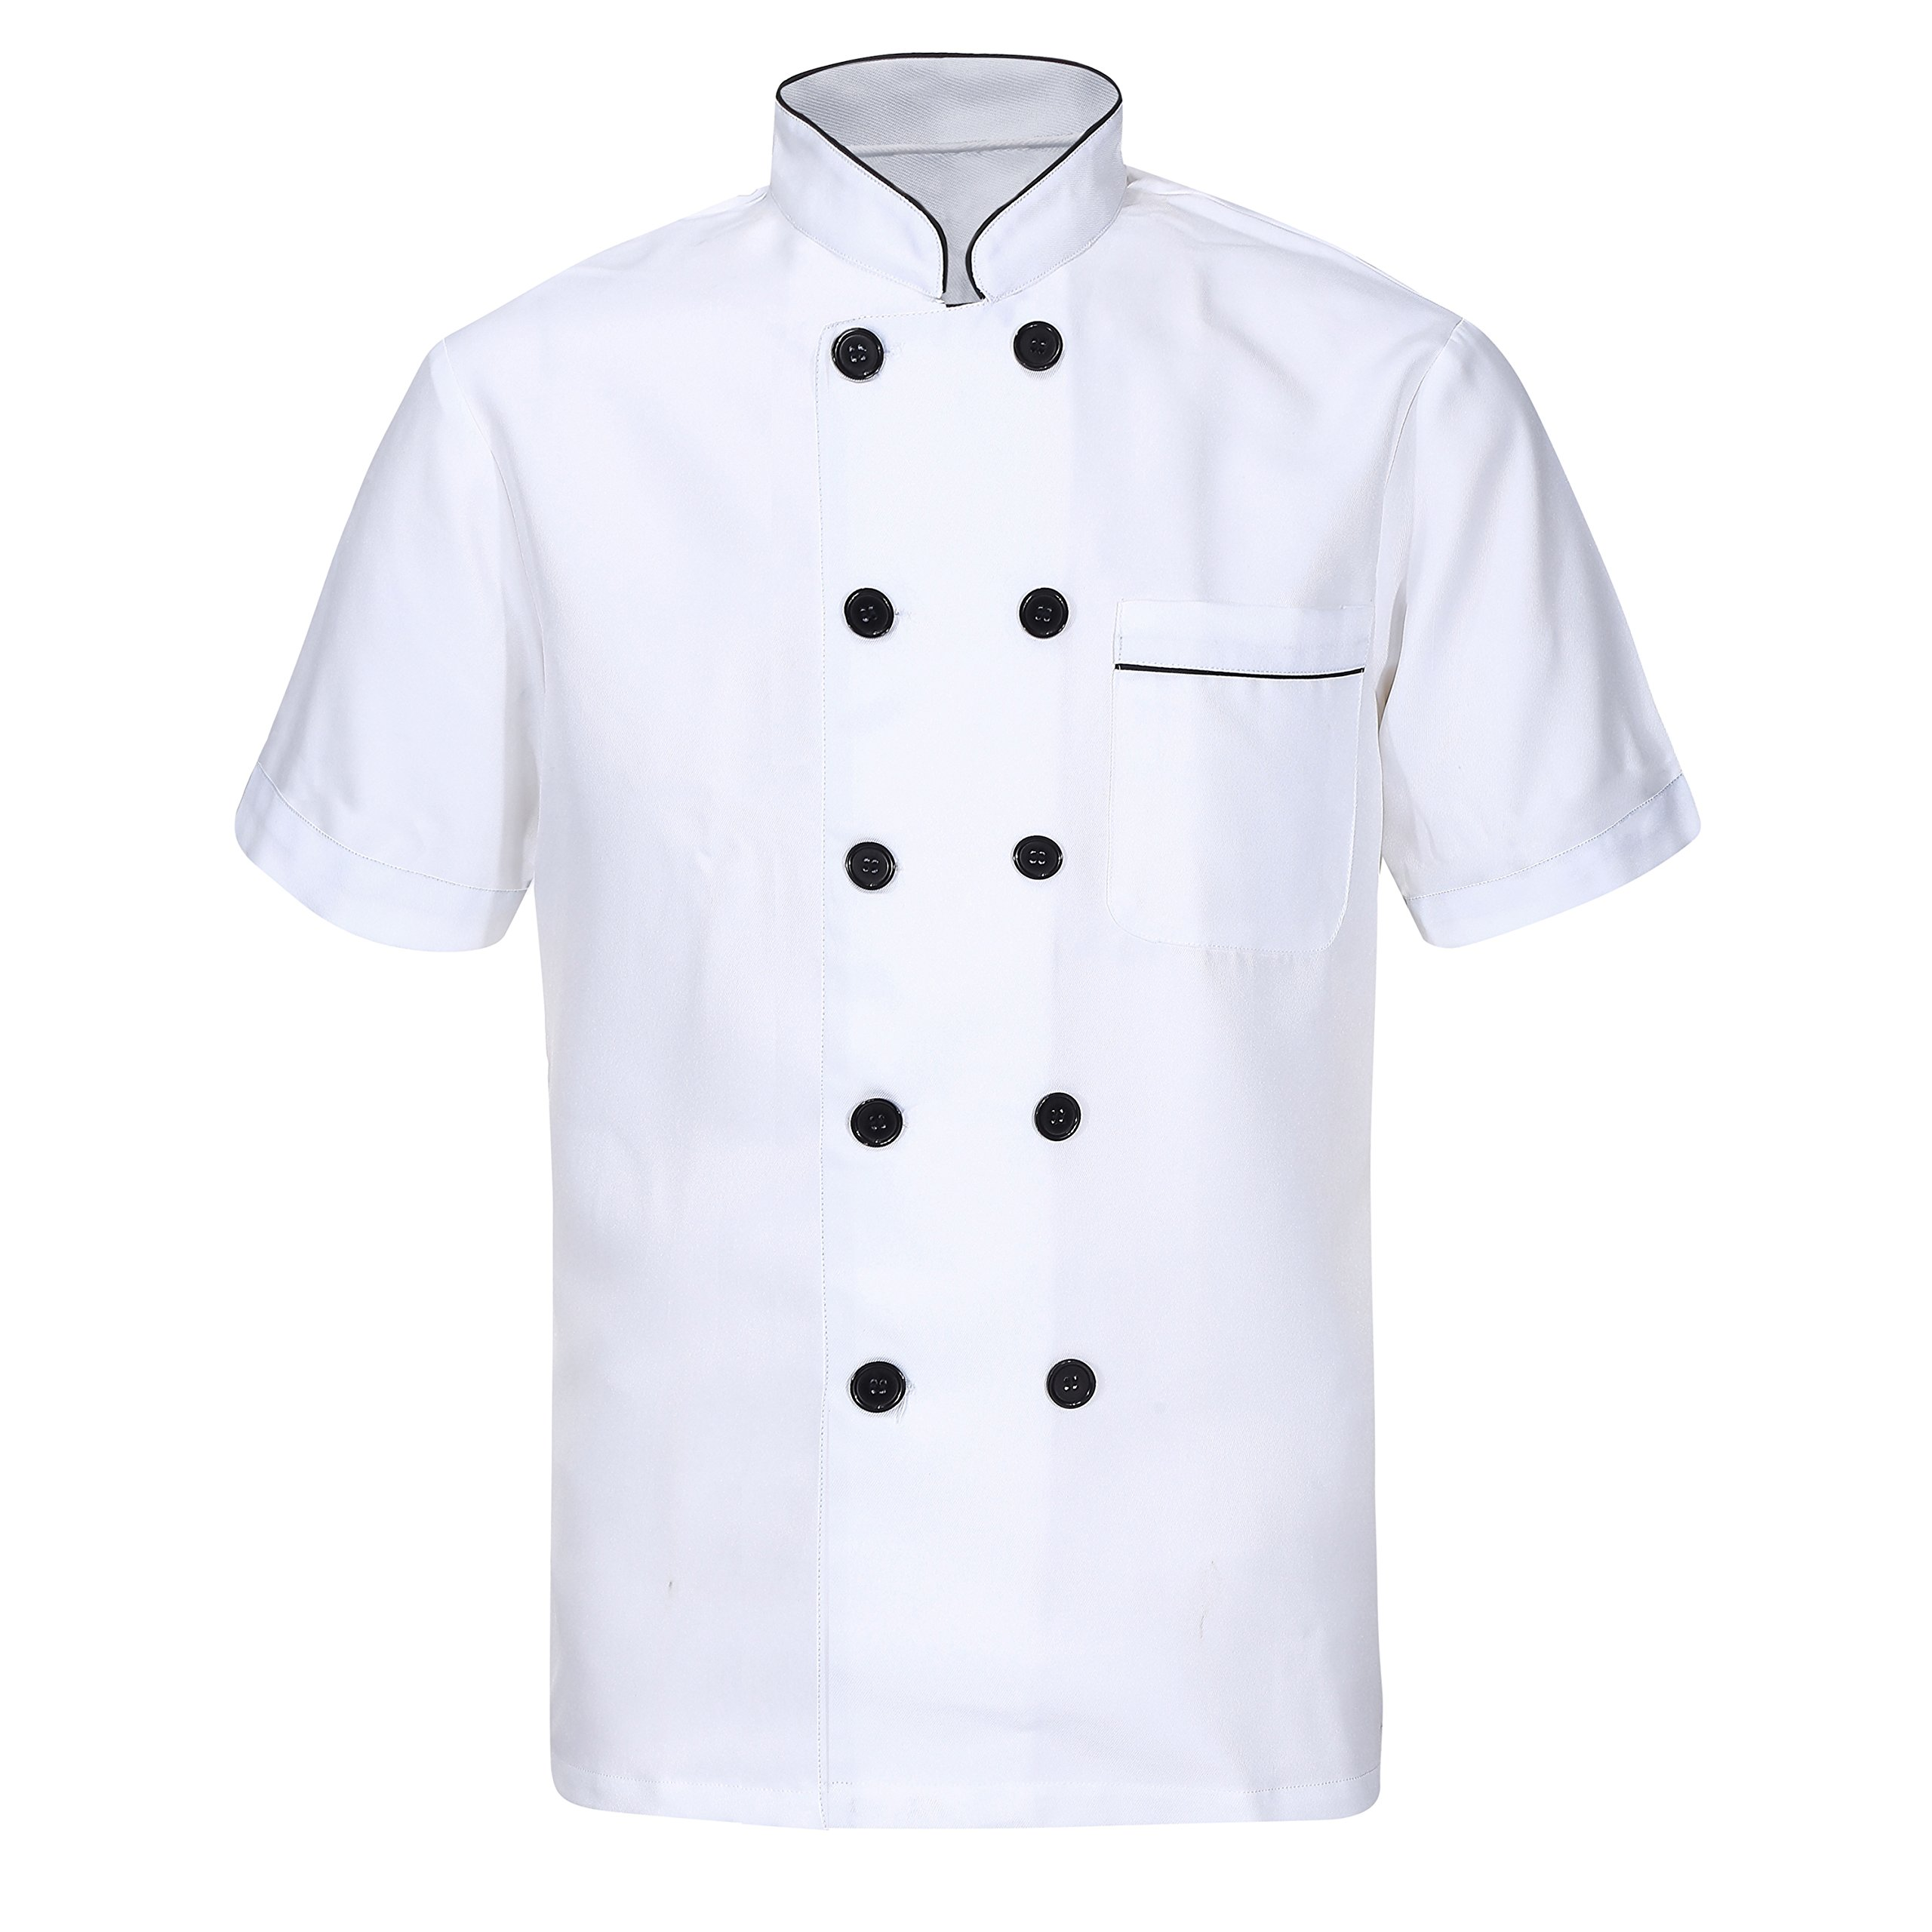 Nanxson Hotel/Kitchen Uniform Long Short Sleeved Working Chef Vest CFM0001 (L, Short Sleeve) by Nanxson